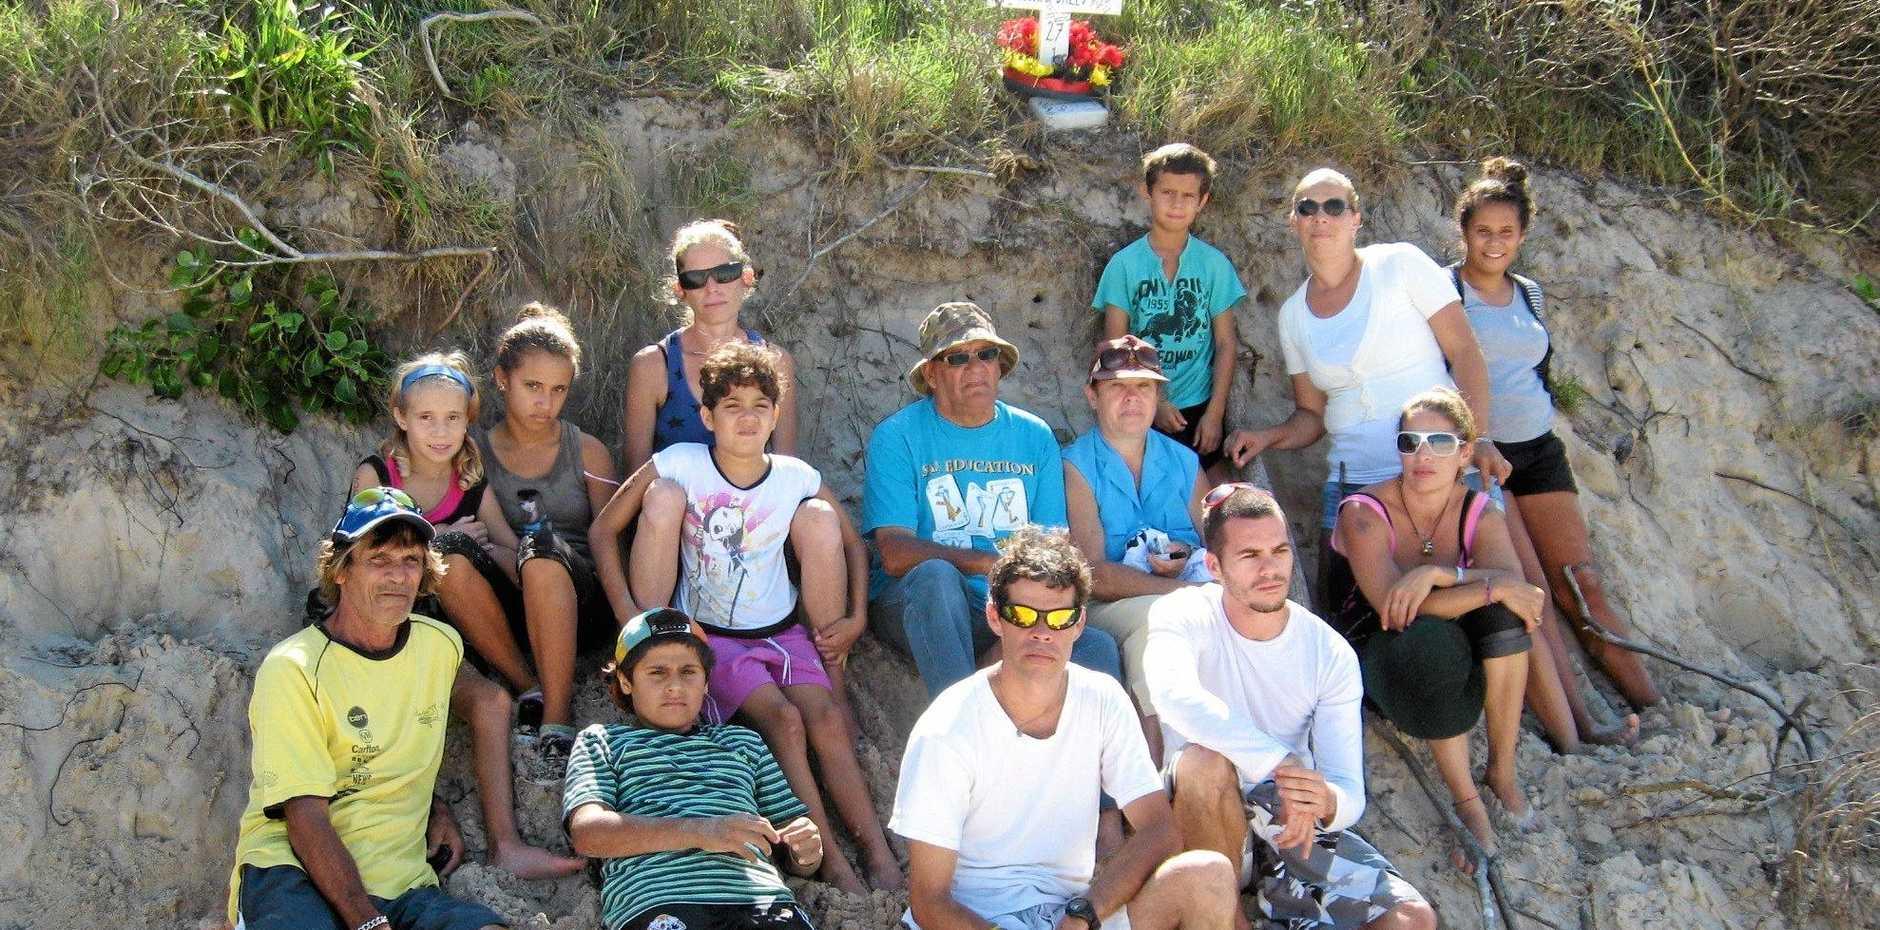 Garage sale fundraiser for Lynette Daley's family | Northern Star